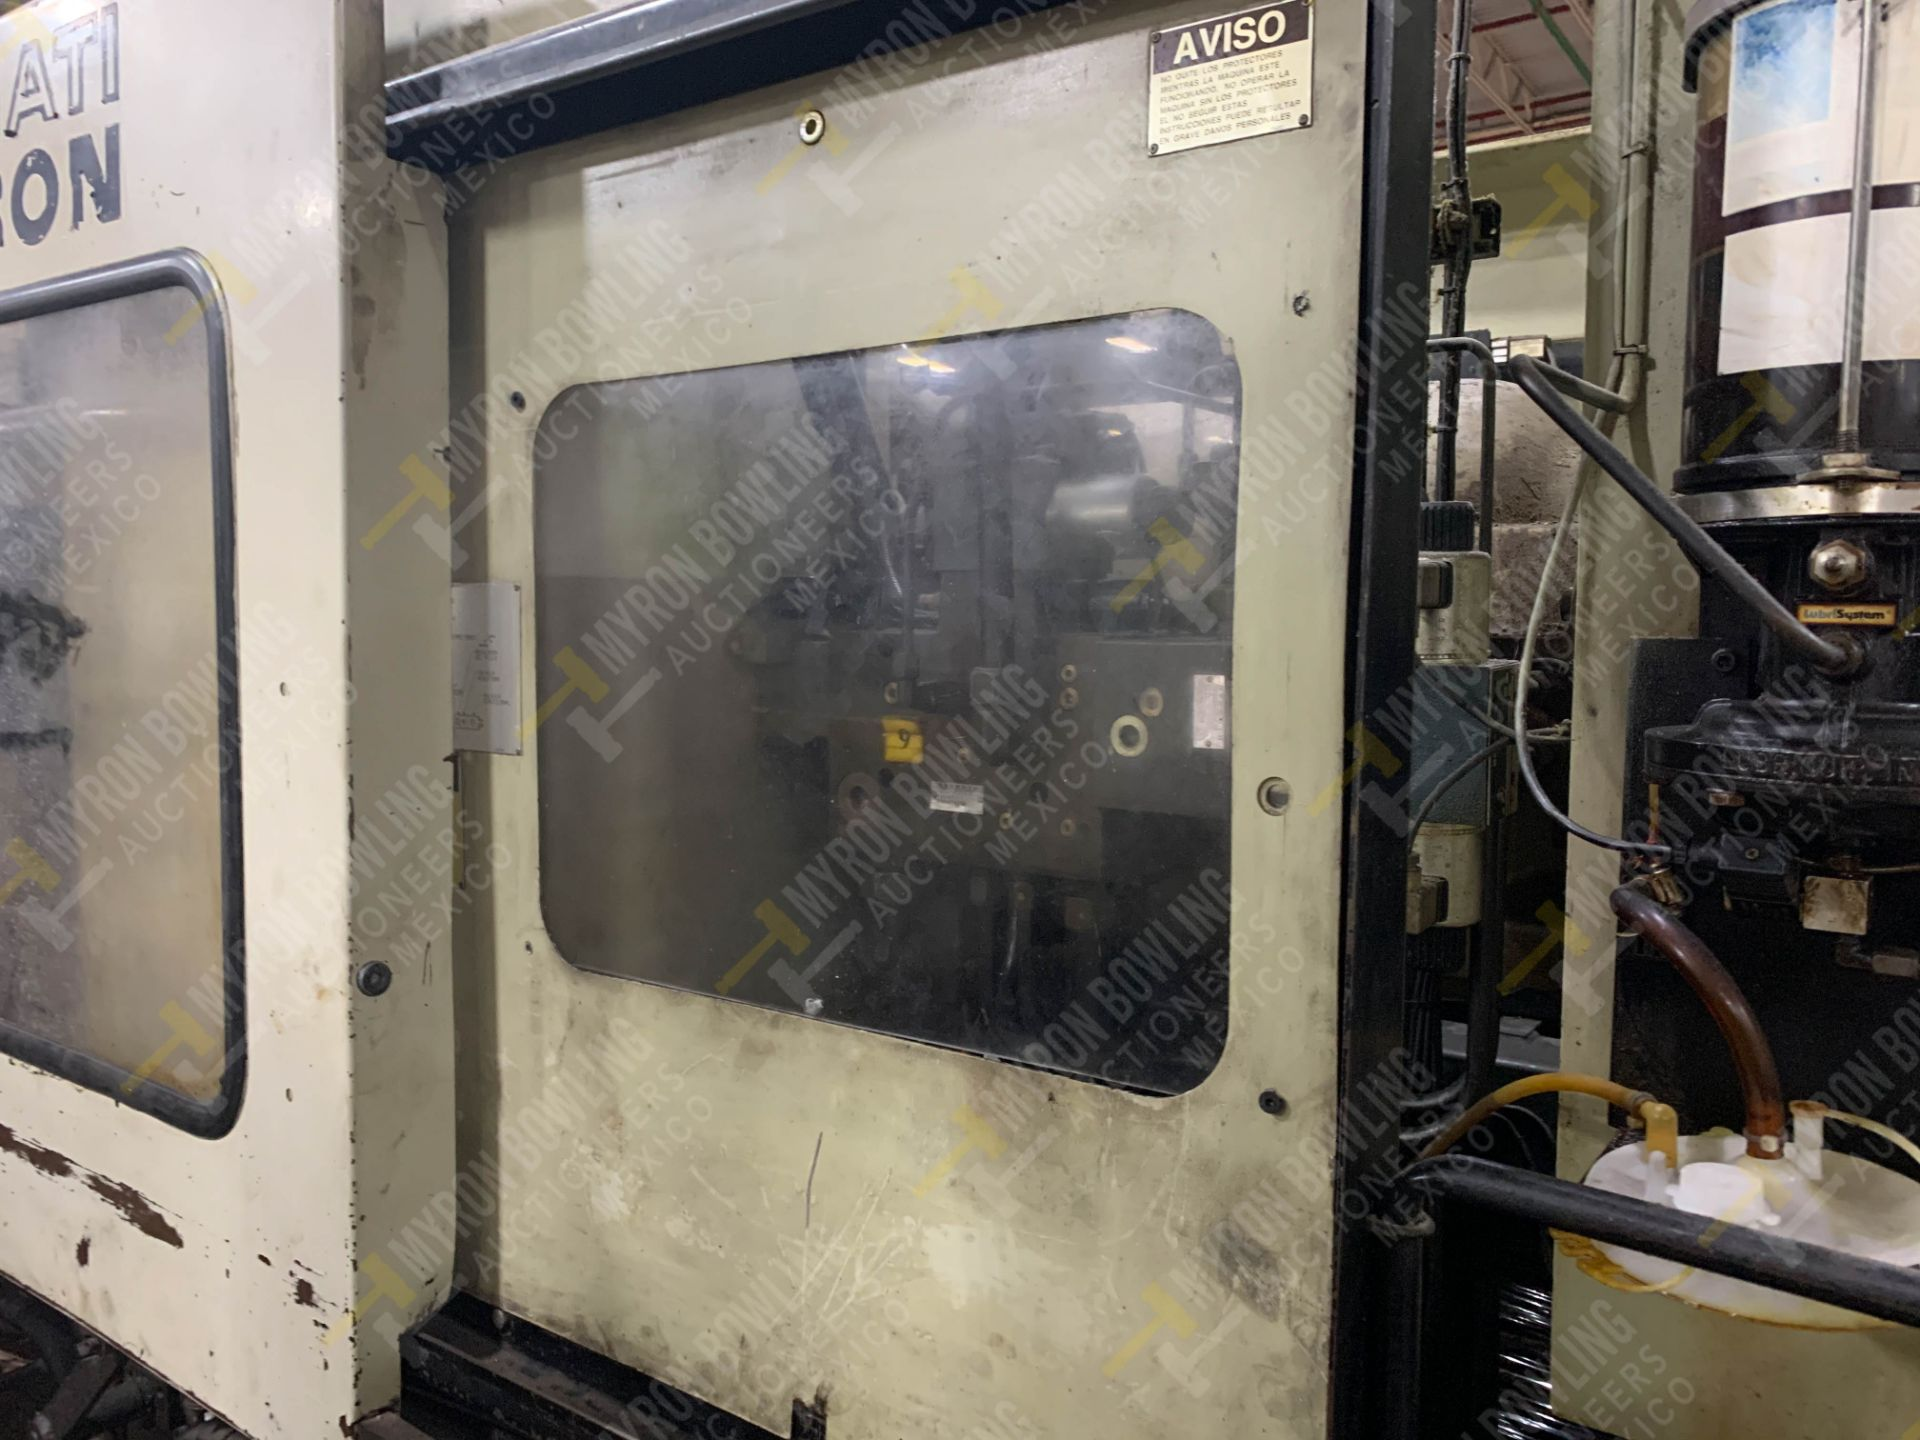 Lot 9 - 220 TON CINCINNATI MILACRON VT-220-17 PLASTIC INJECTION MOLDING MACHINE, MFG YEAR 1994